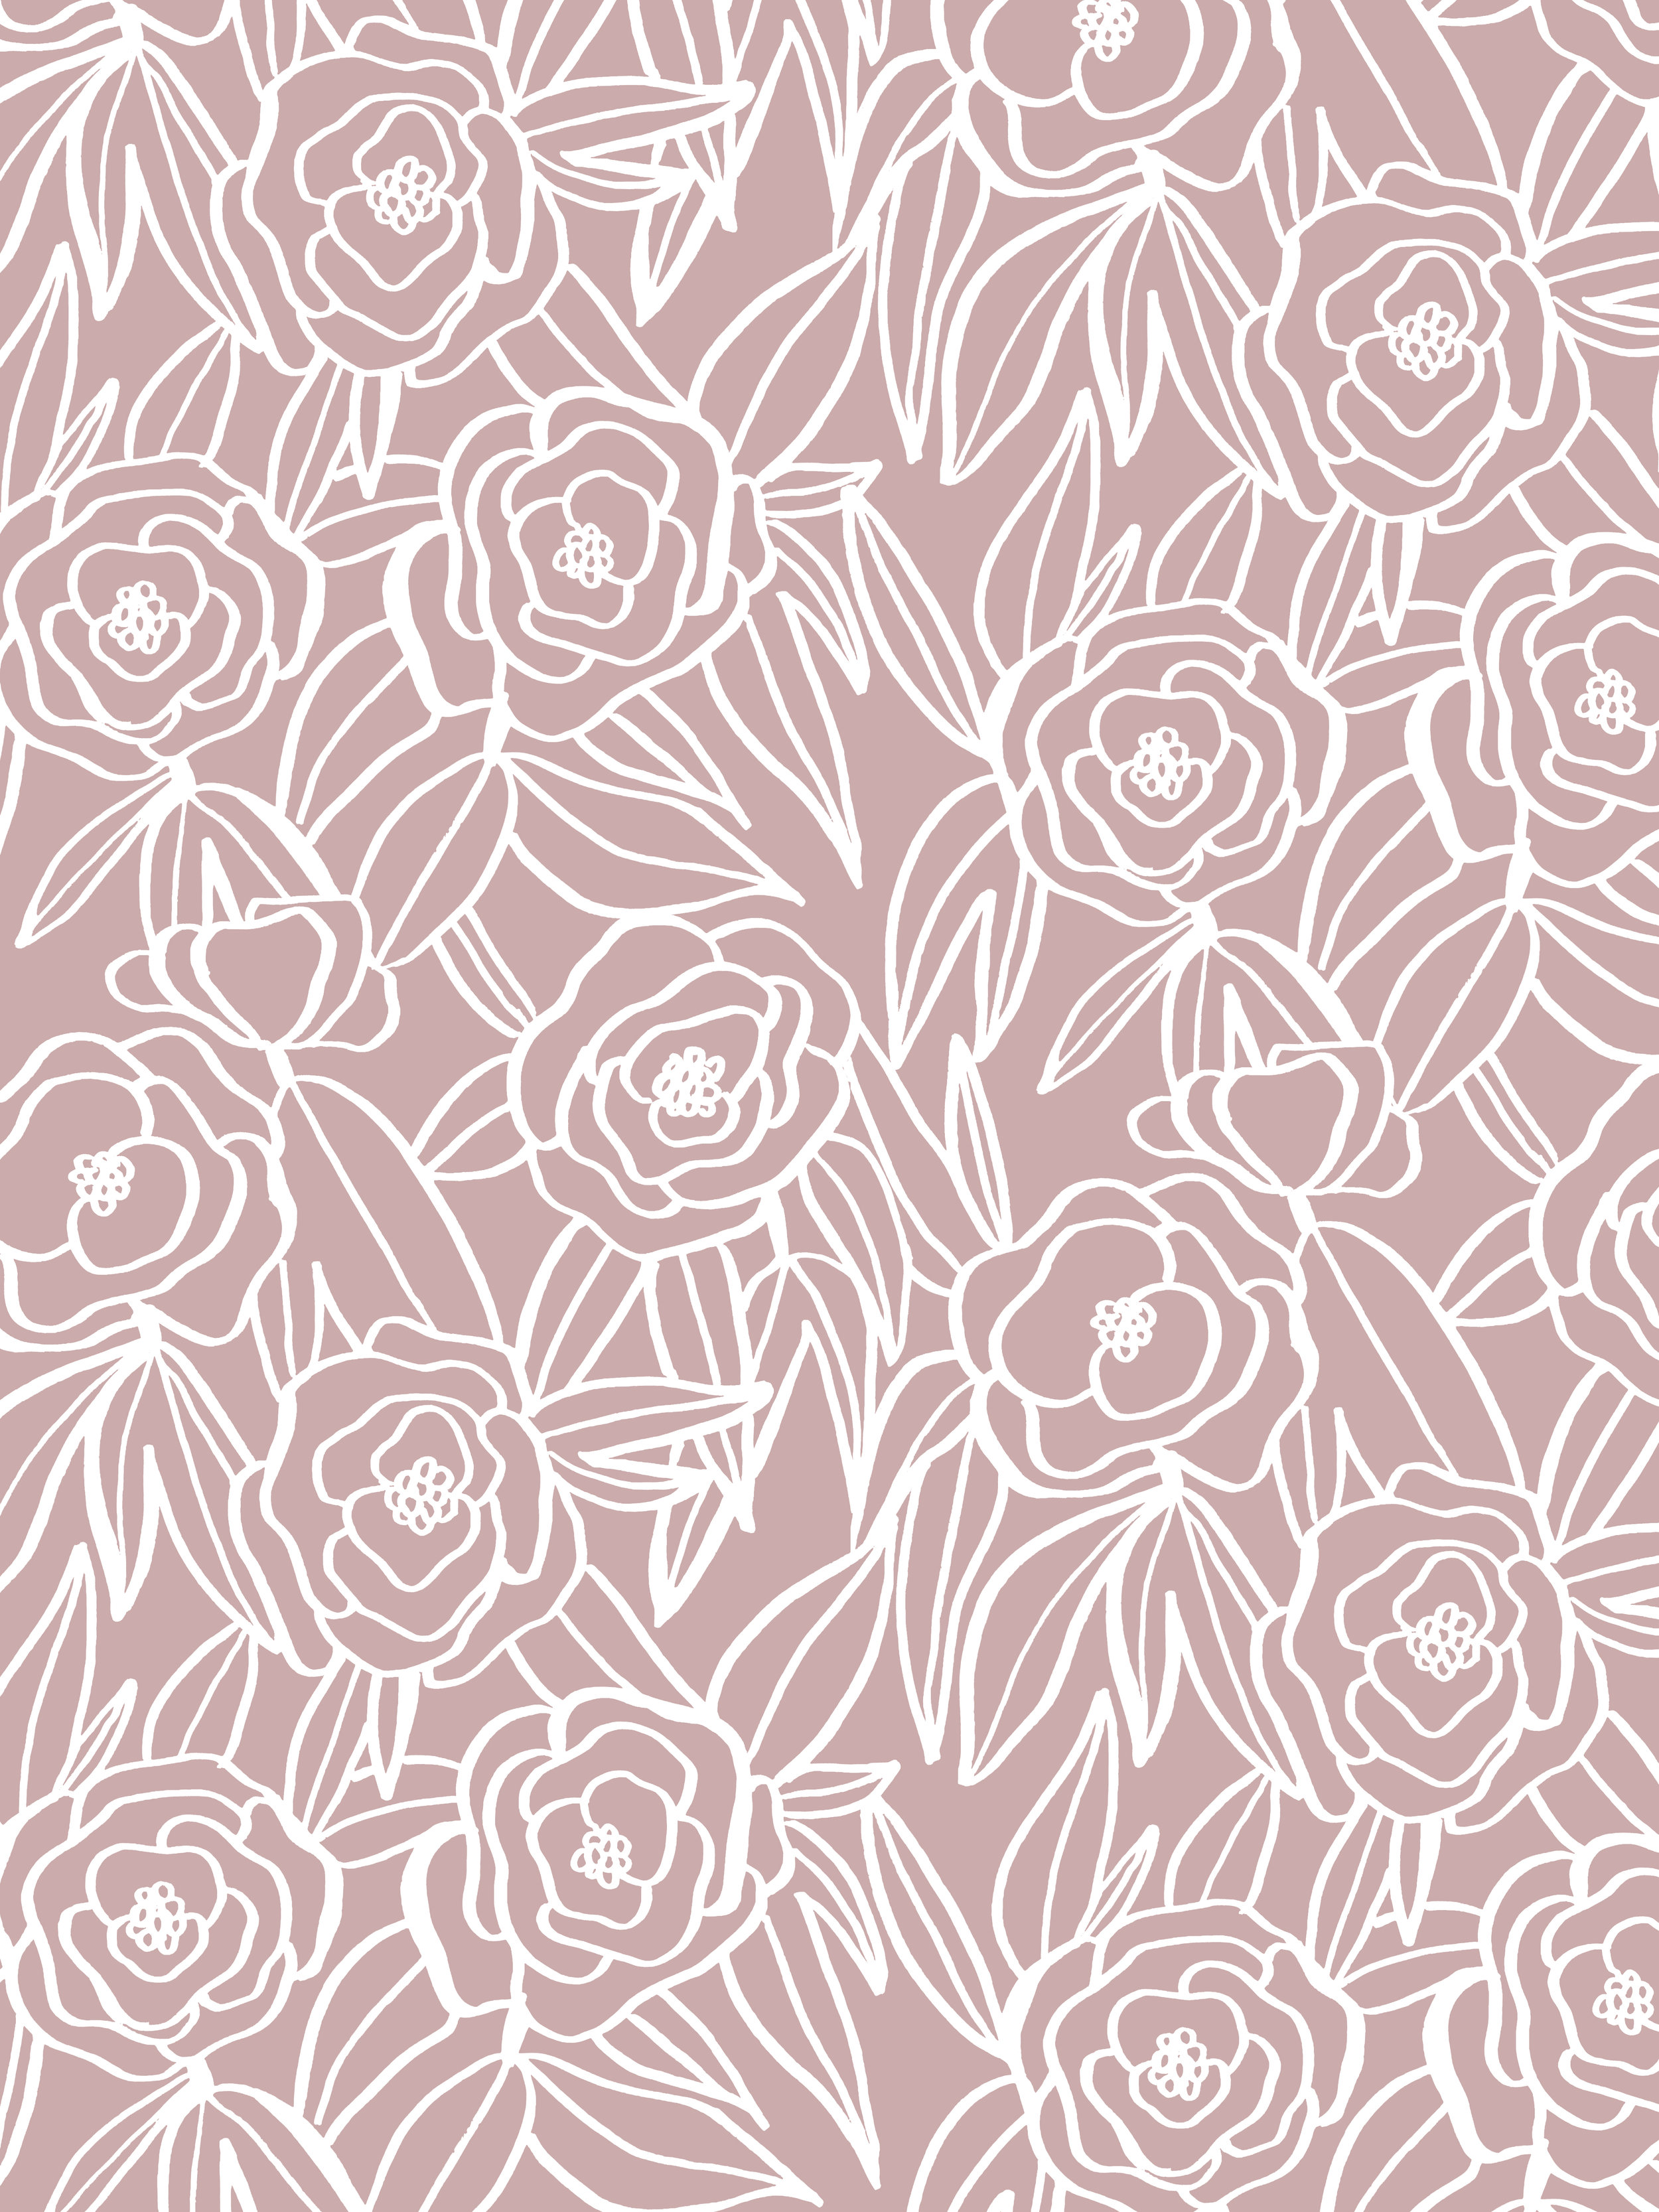 blooms pink background.jpg